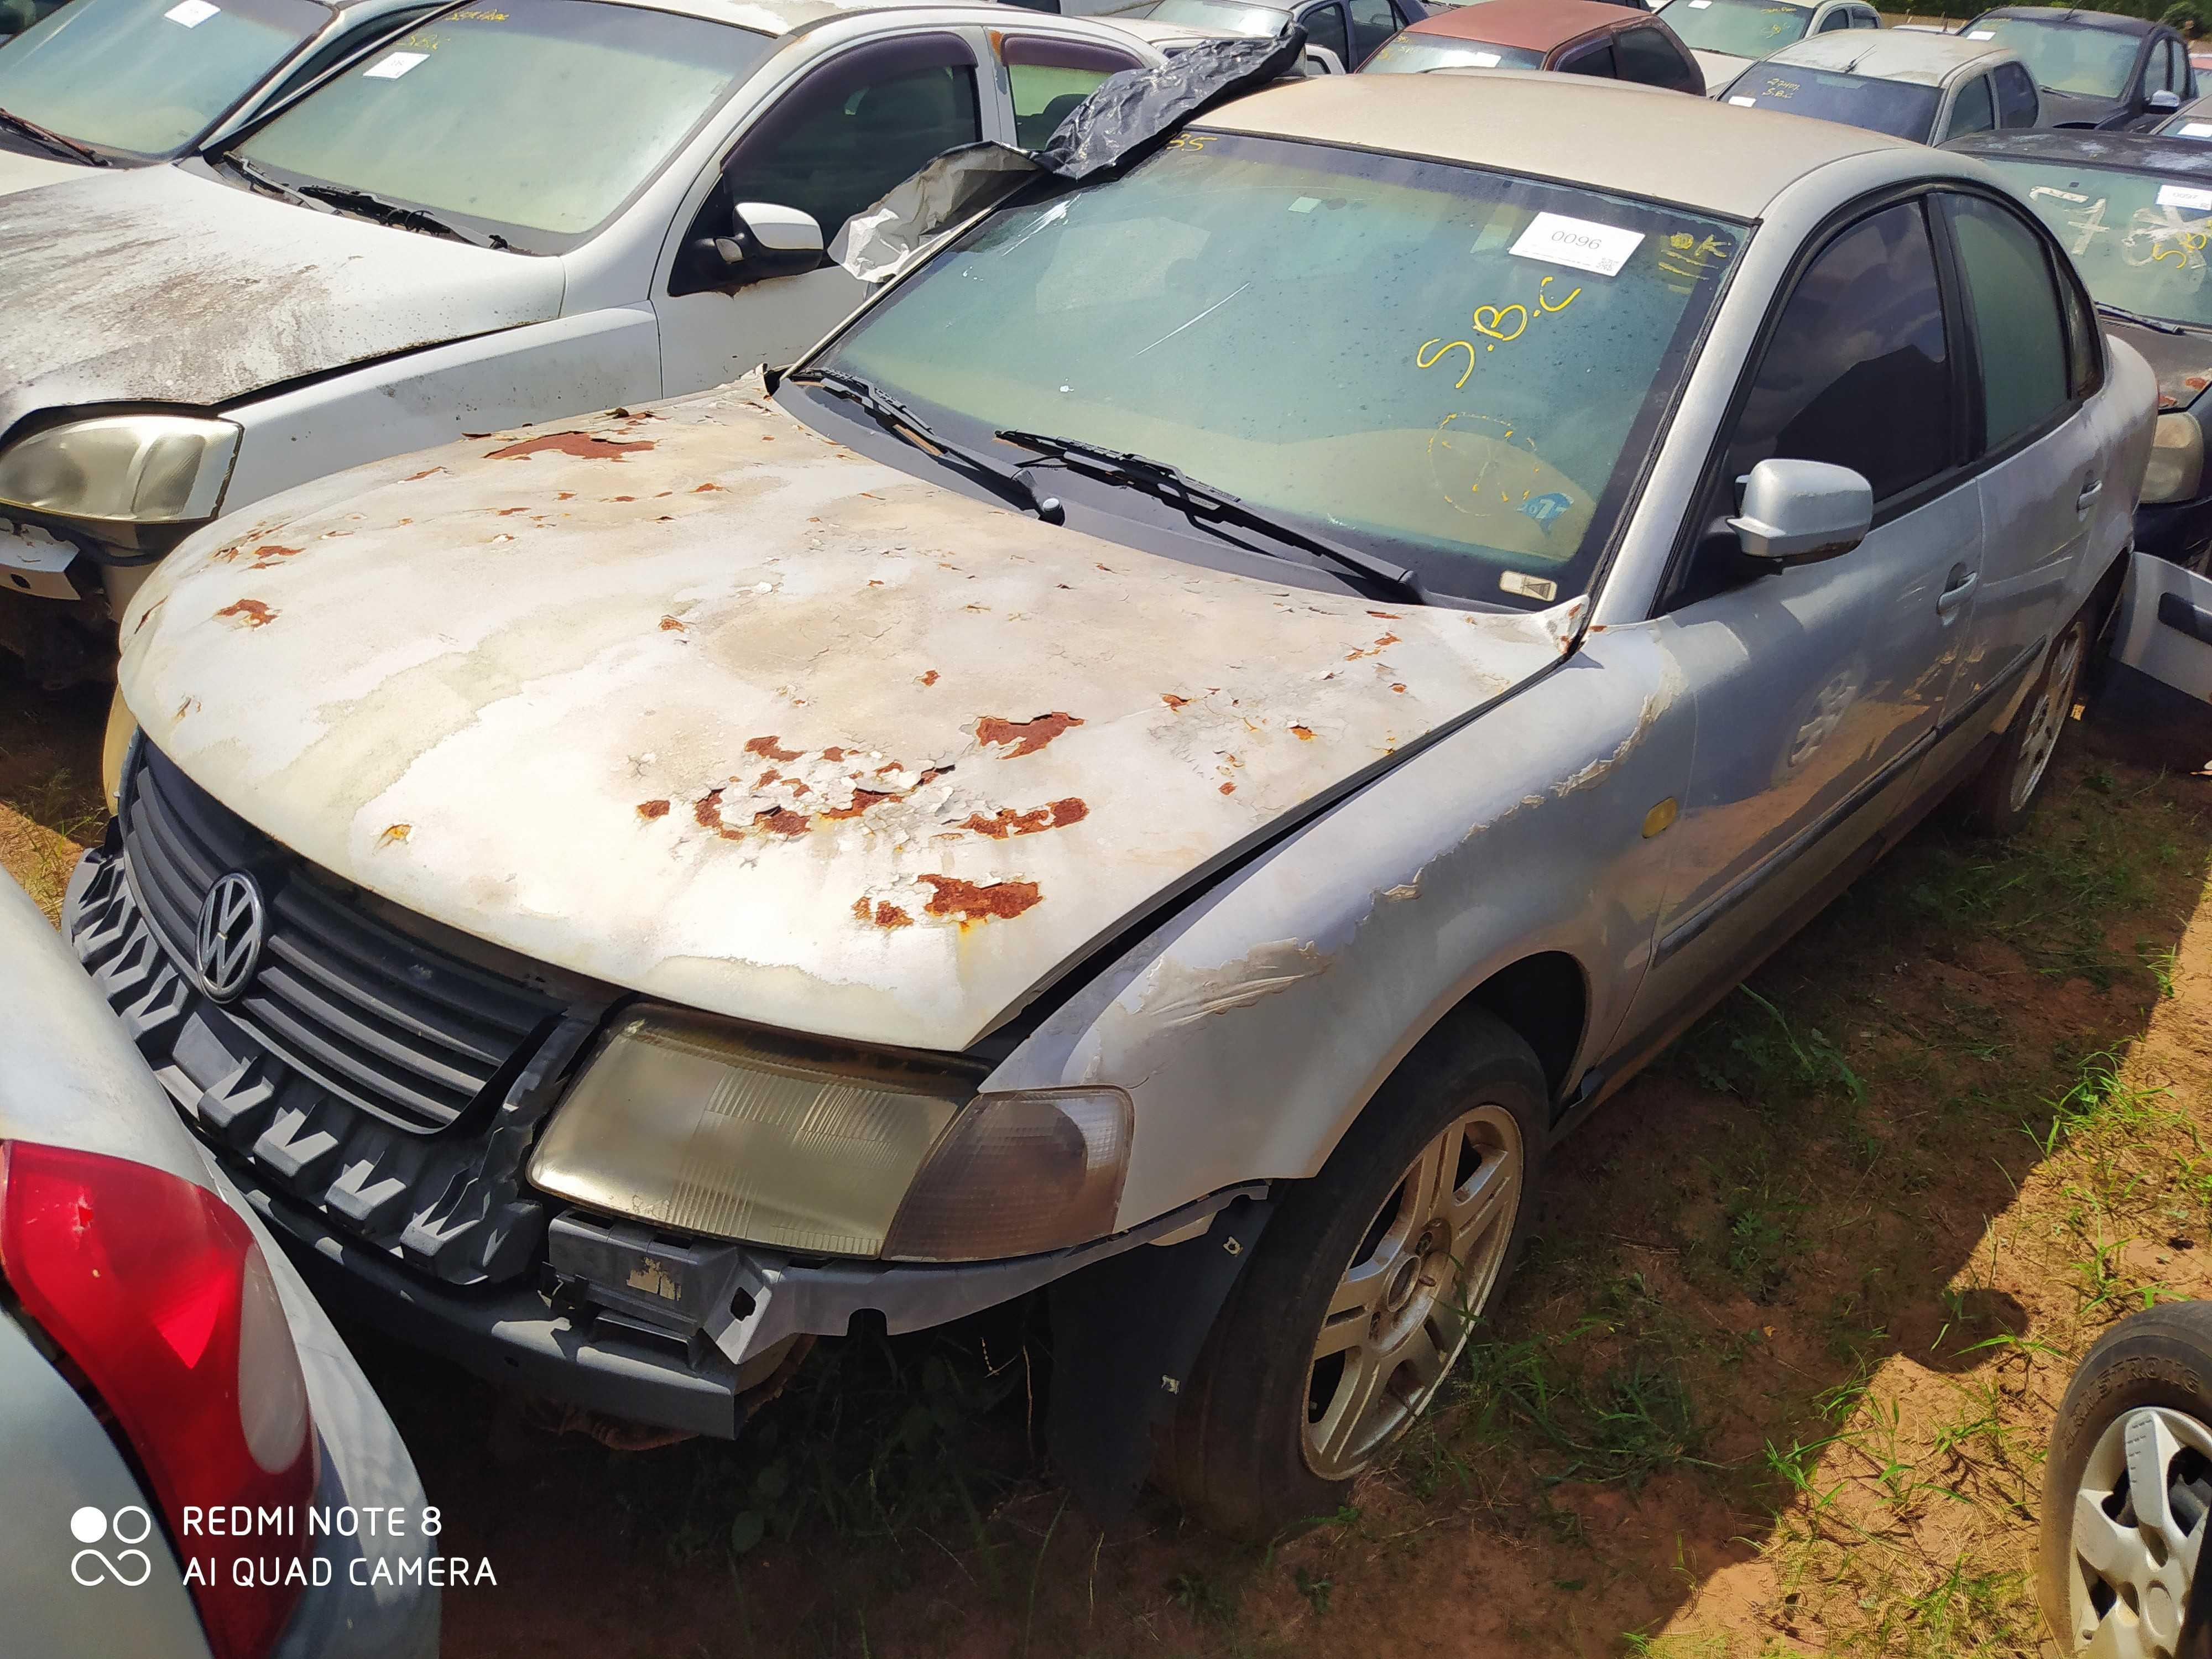 VW/VW PASSAT - 1998/1999 - Sucata Aproveitavel